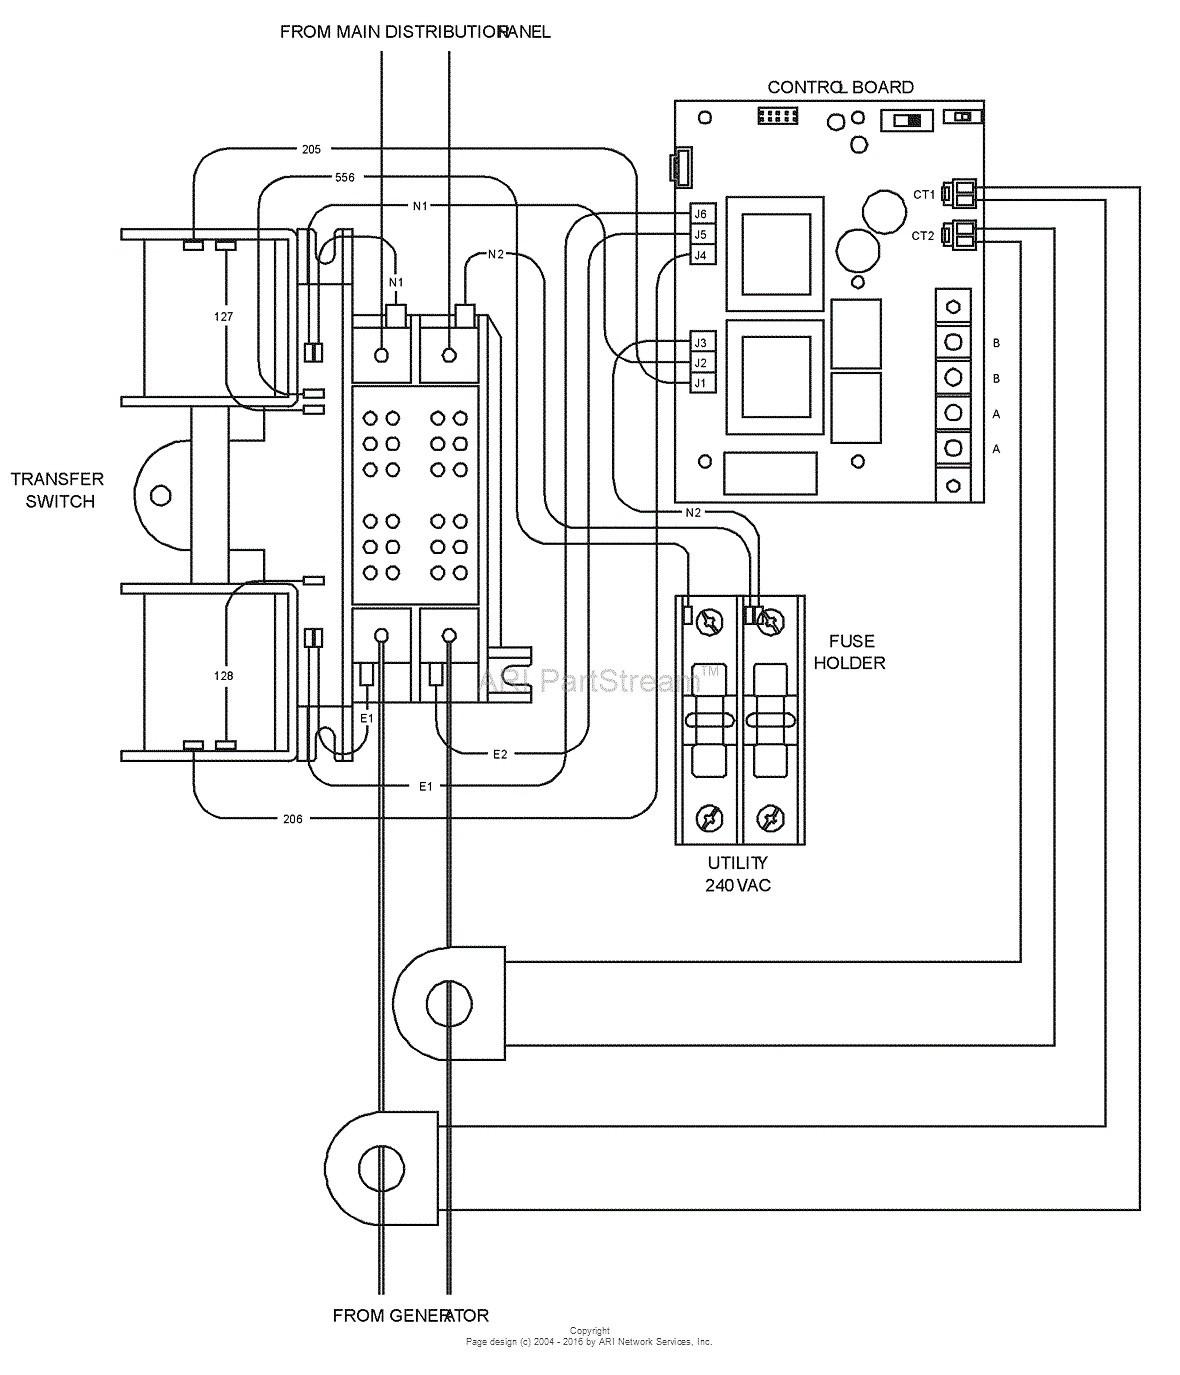 Pleasing Generac Rts Transfer Switch Wiring Diagram Standard Electrical Wiring Cloud Overrenstrafr09Org